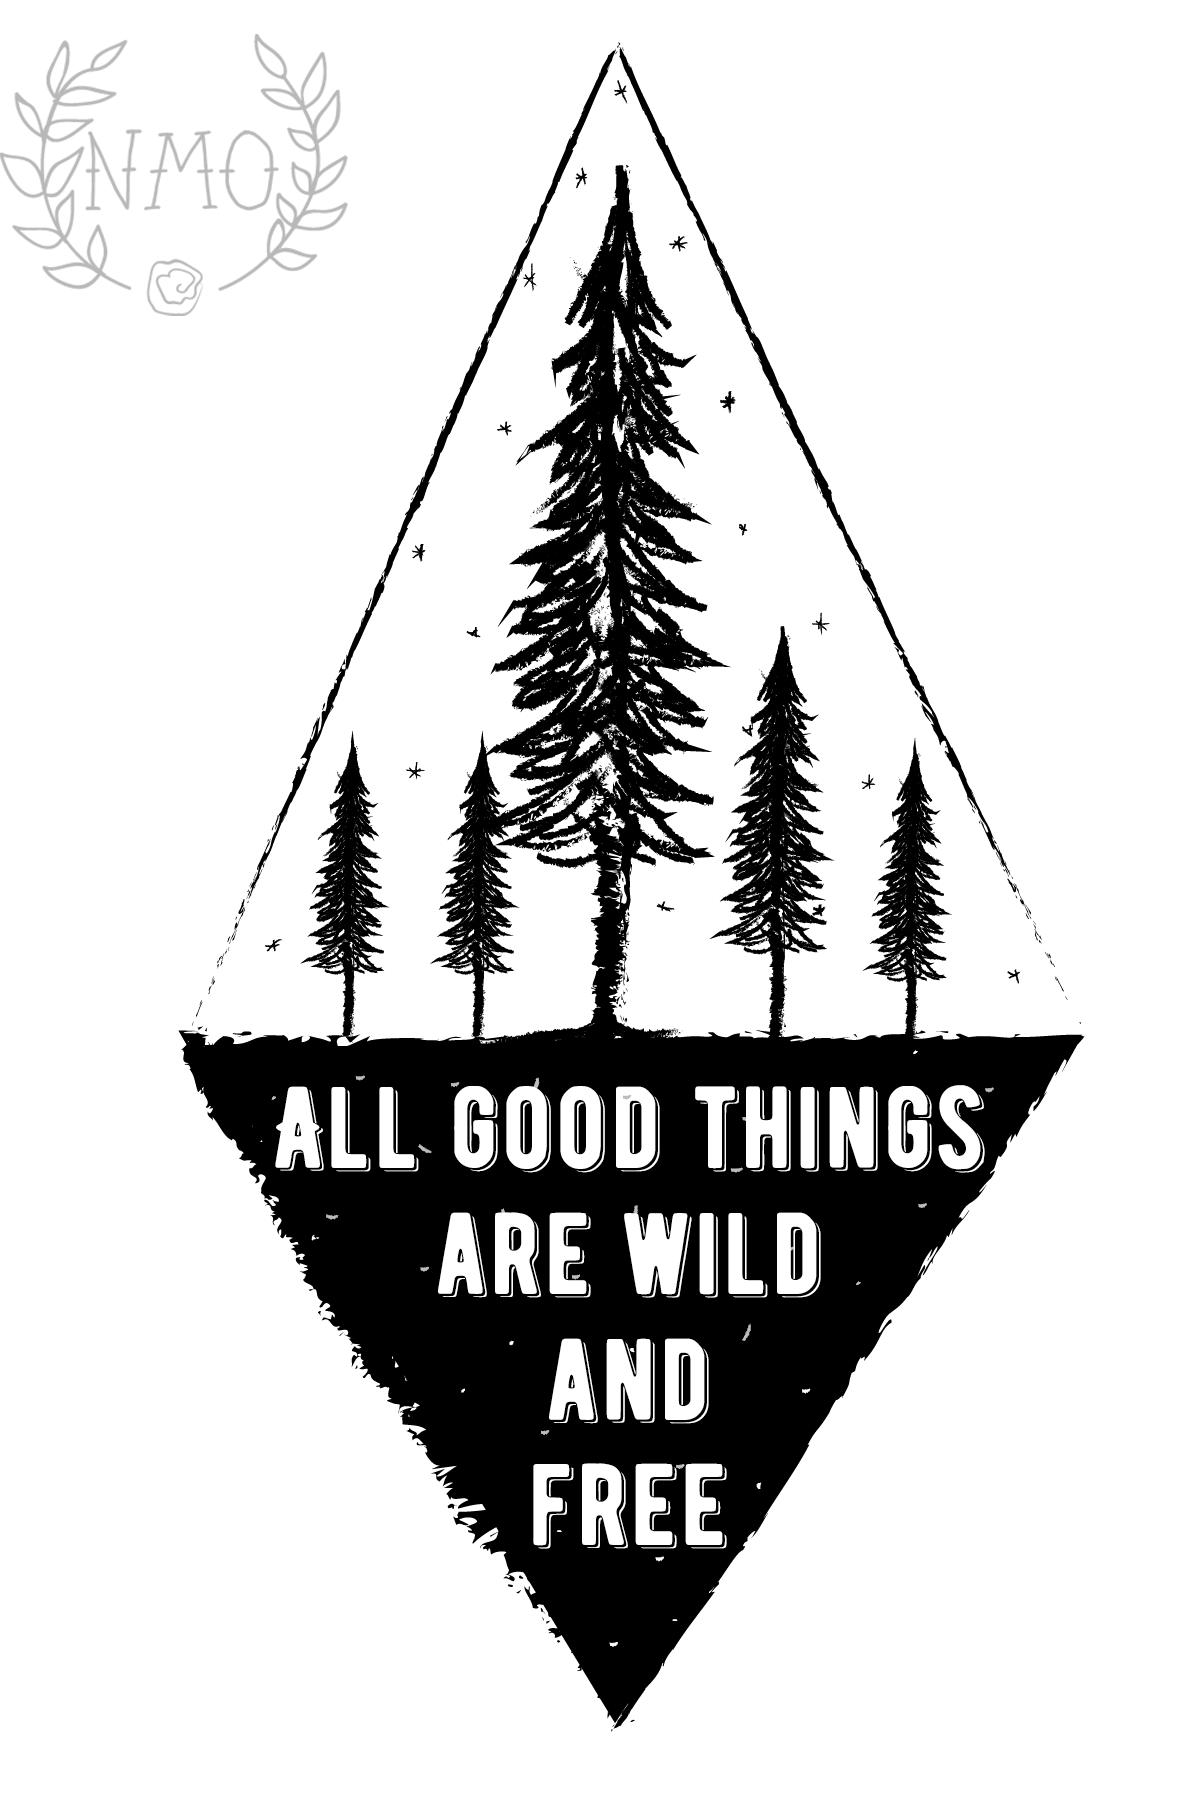 #quote #wild #ilustration illustration by NoMeOlvides Design